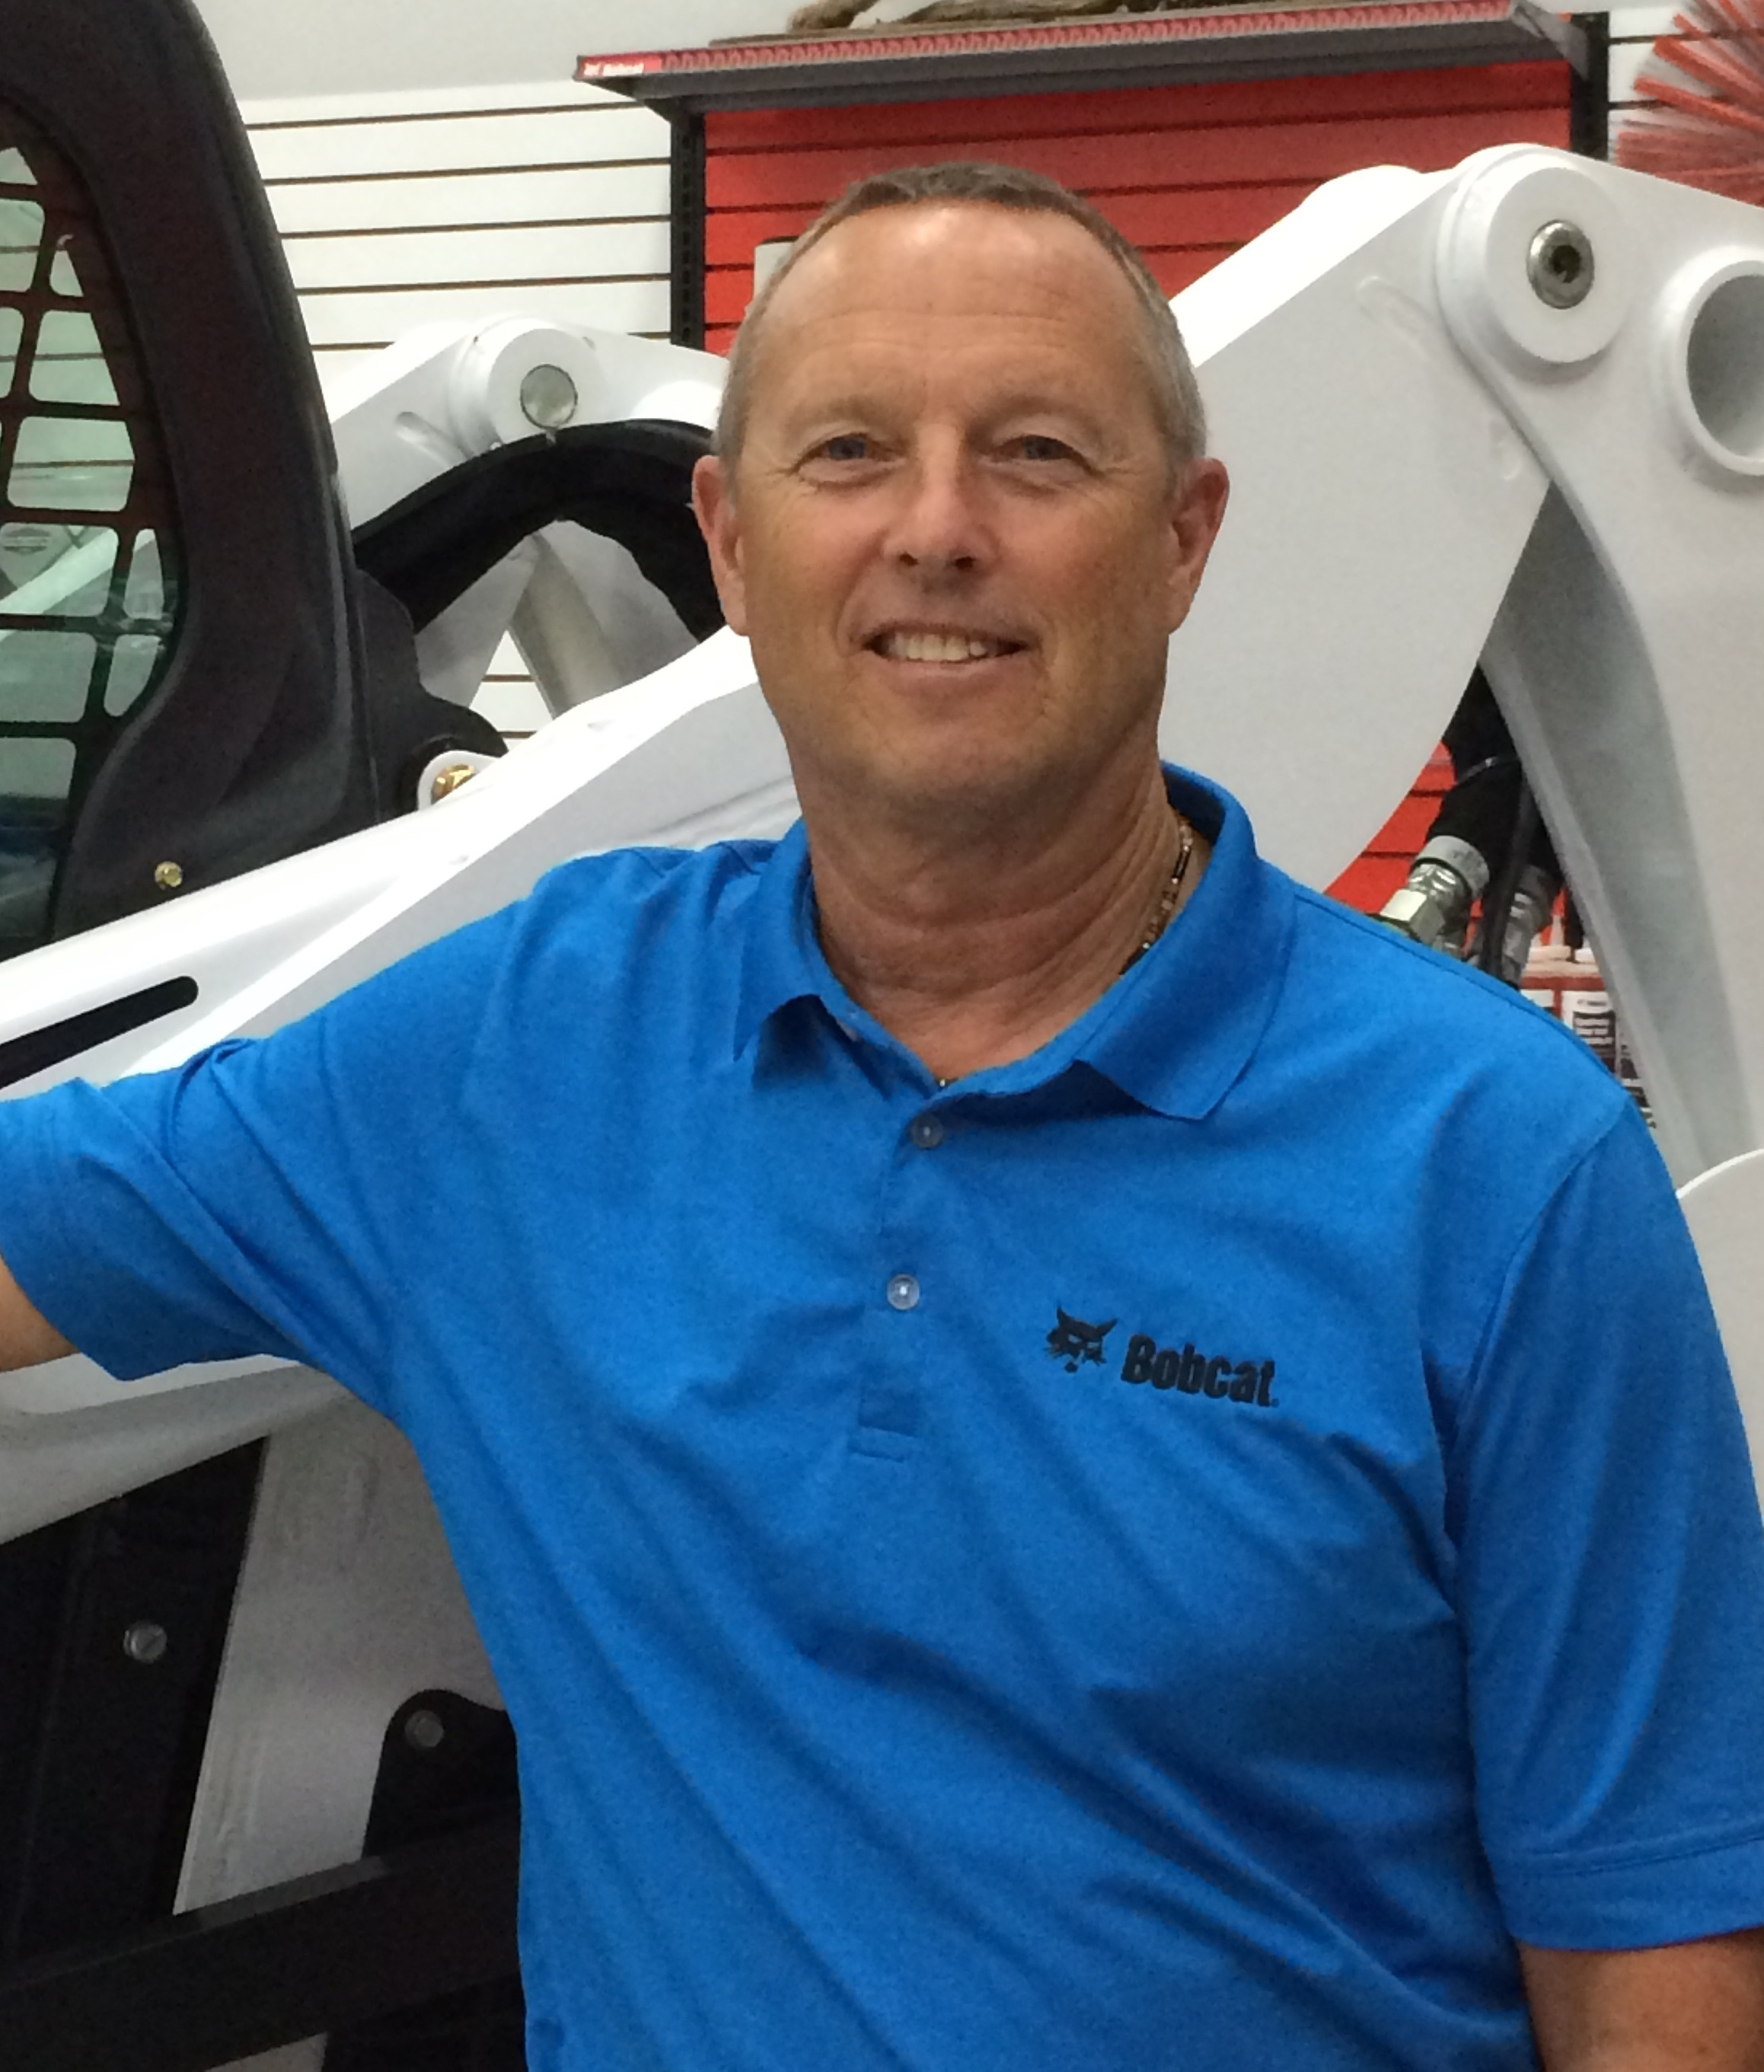 Carroll & Howard County Sales Specialist